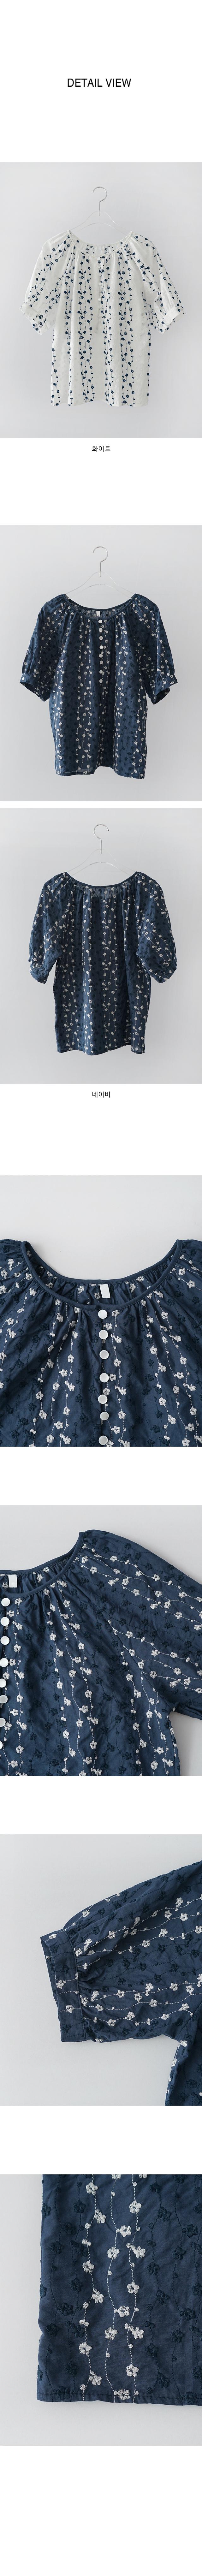 needlepoint raglan blouse